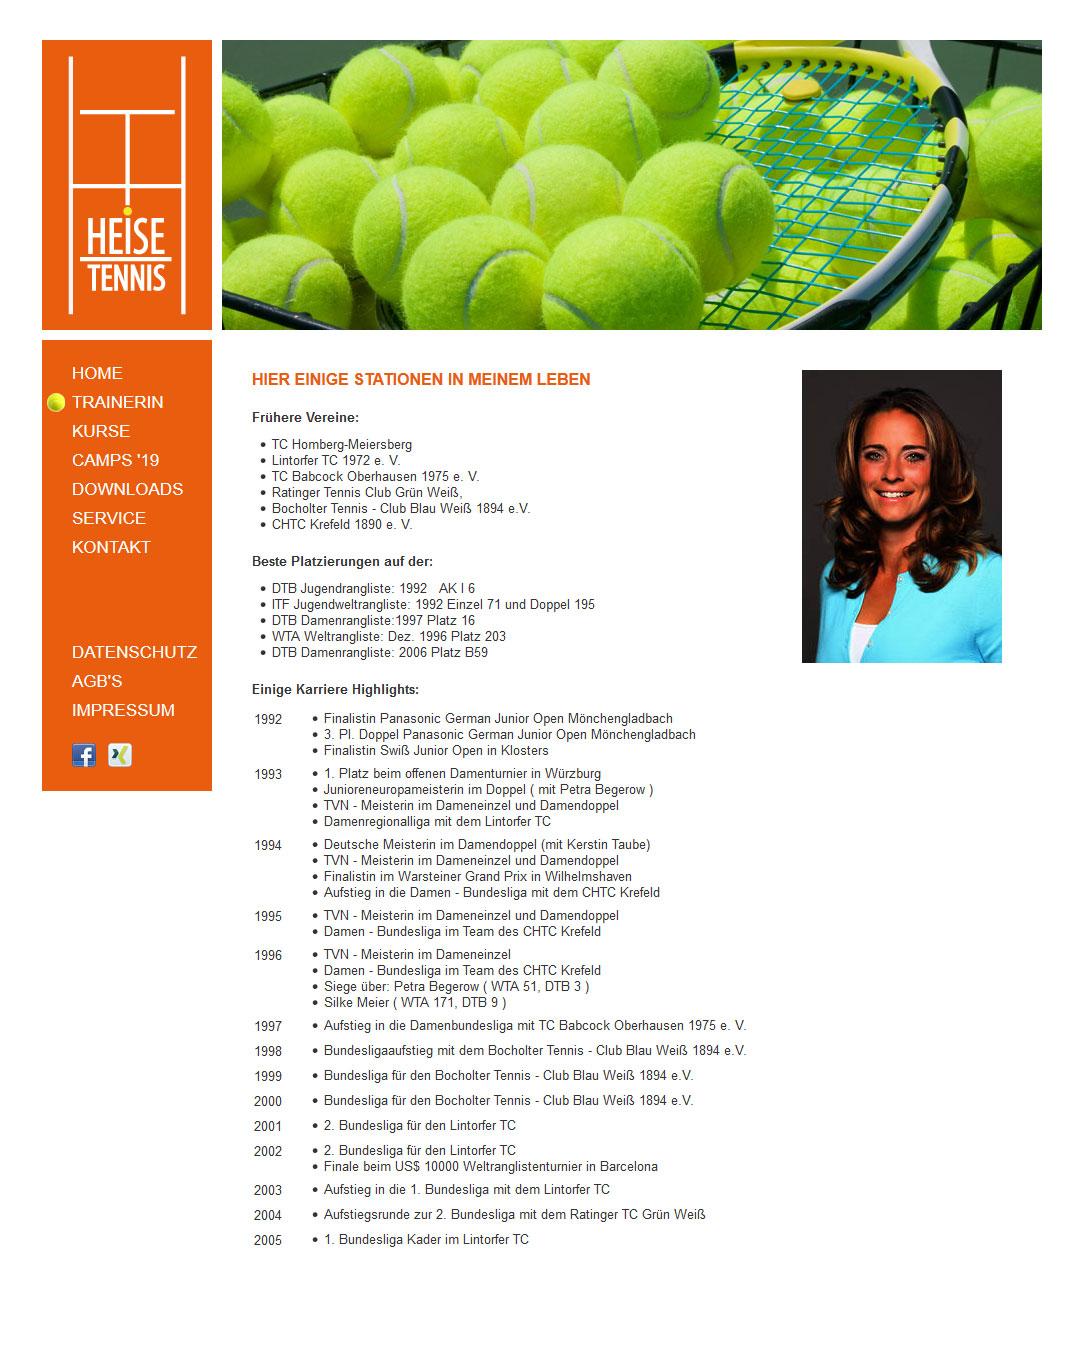 Heise Tennis